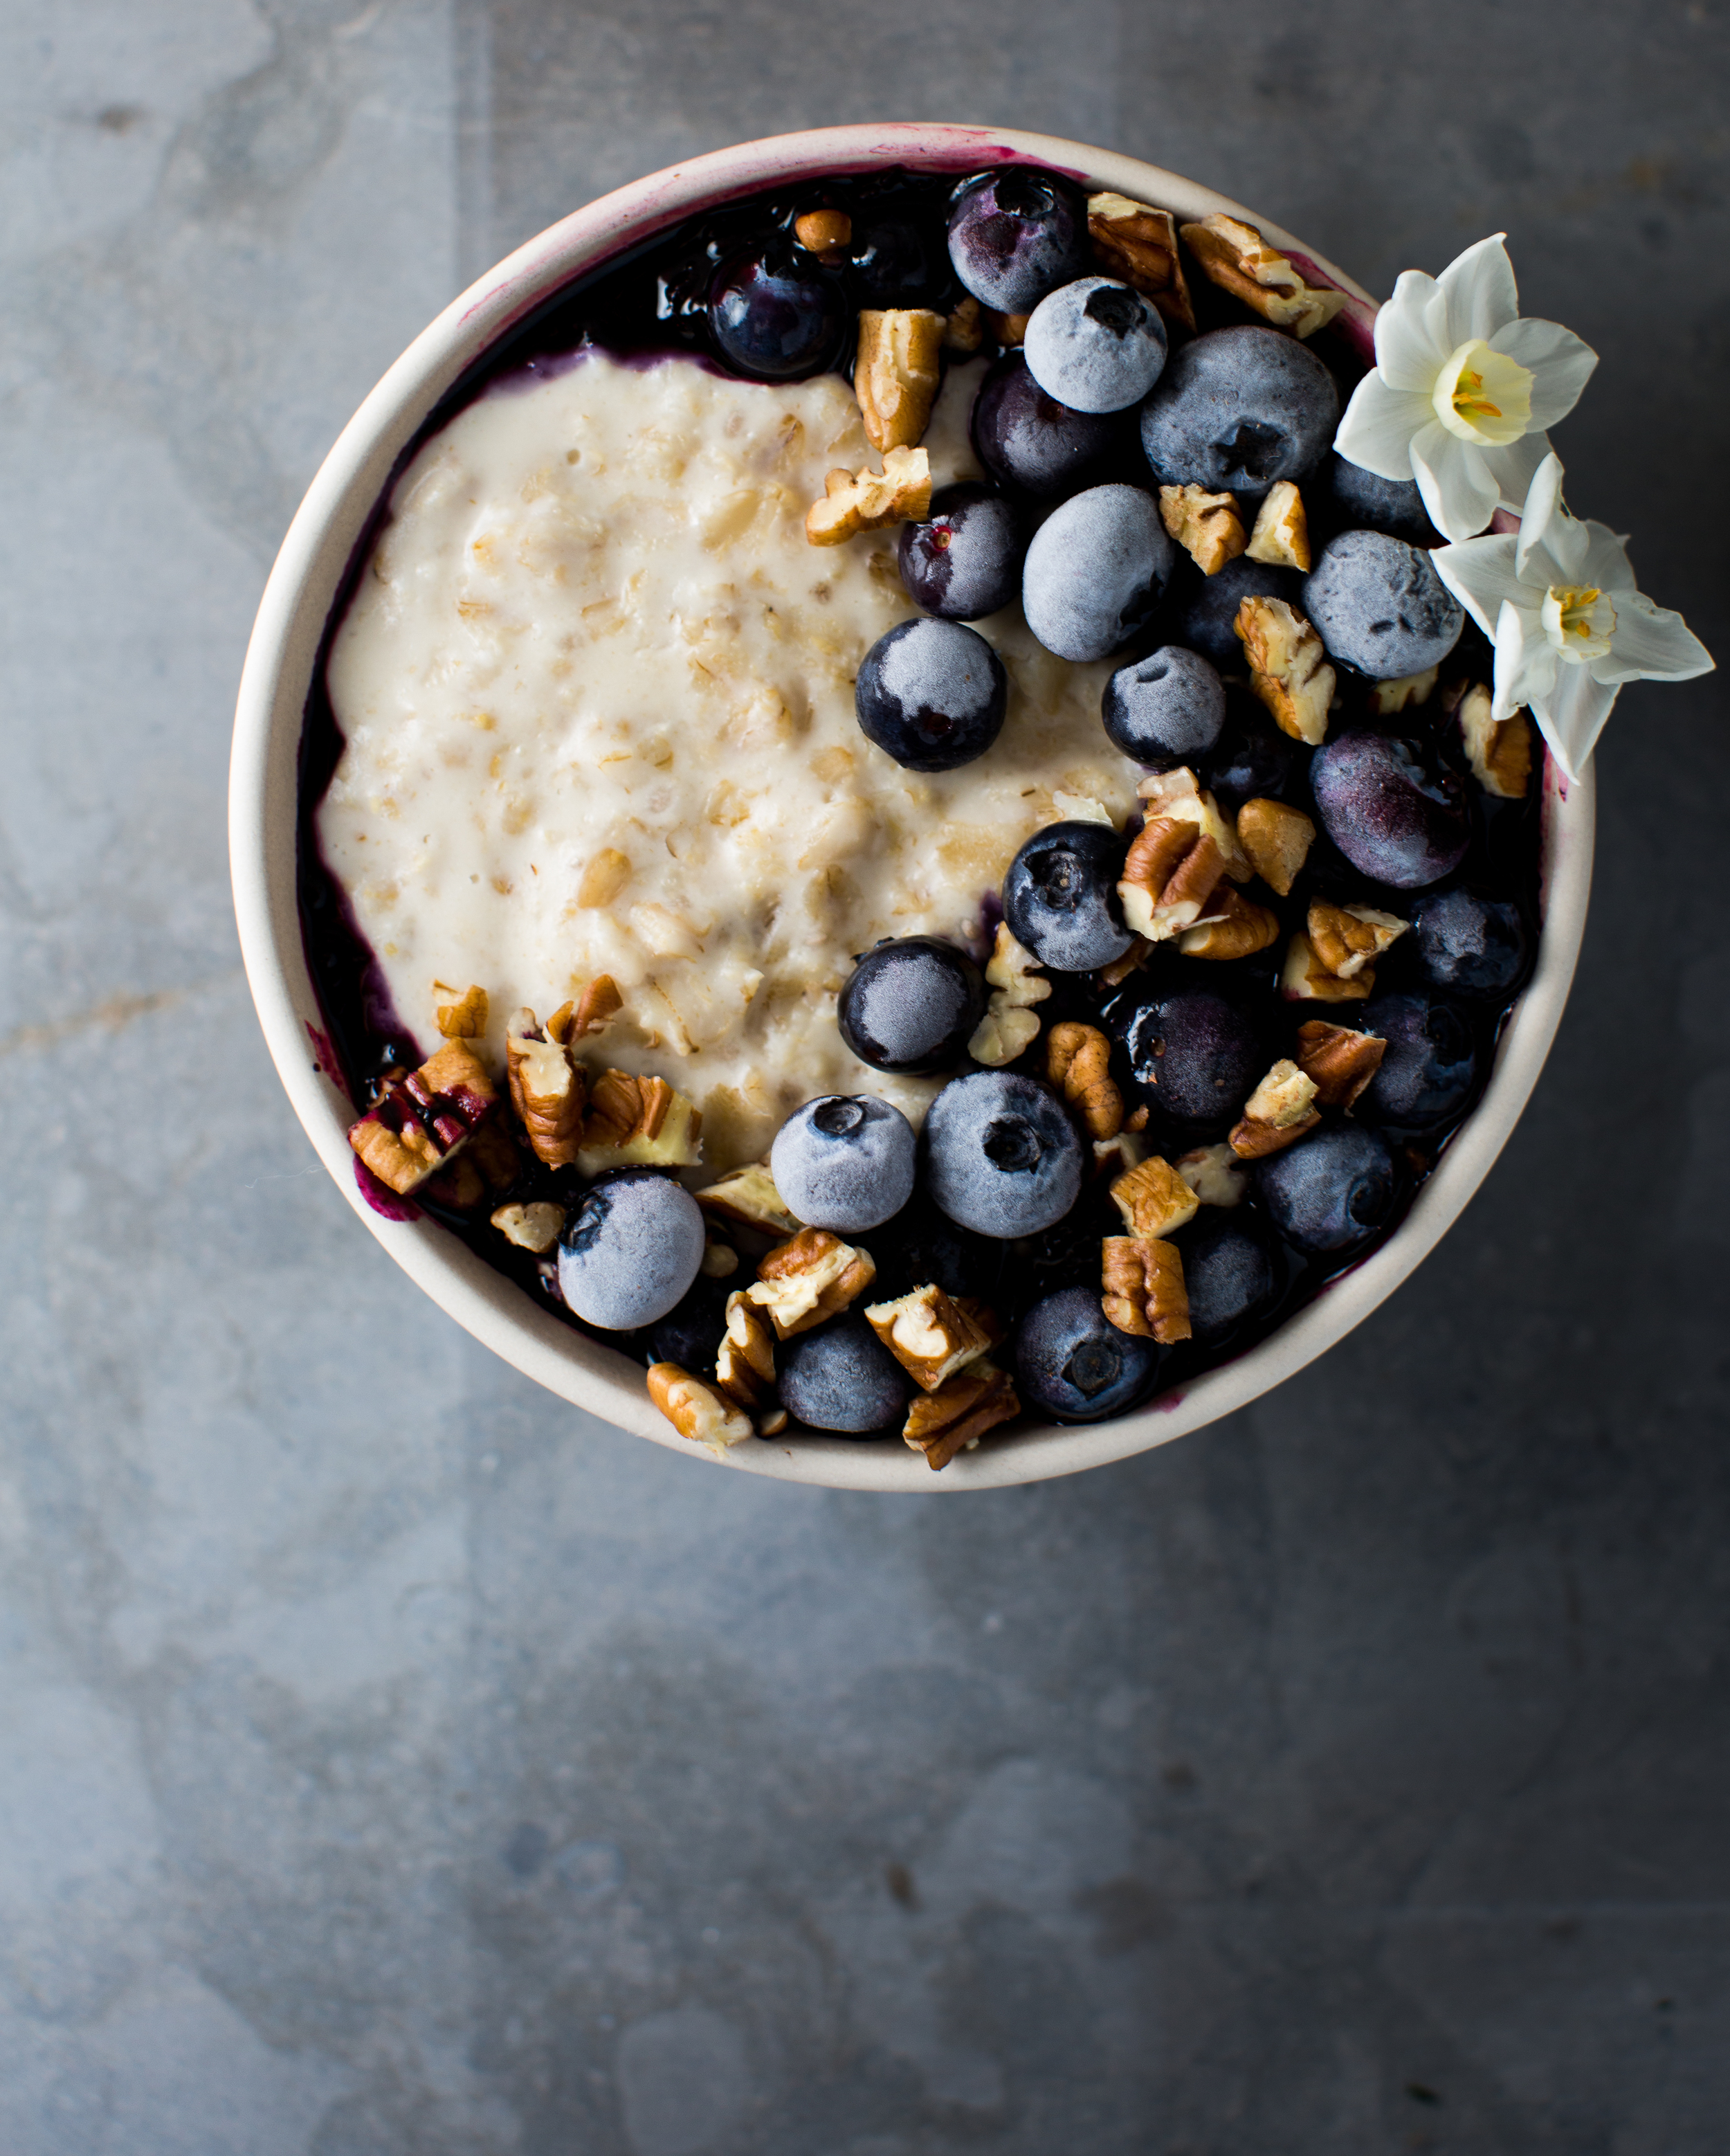 4-Macadamia-Nut-Milk-Porrisge-with-Bluberry-Lemon-Jam   www.8thandlake.com